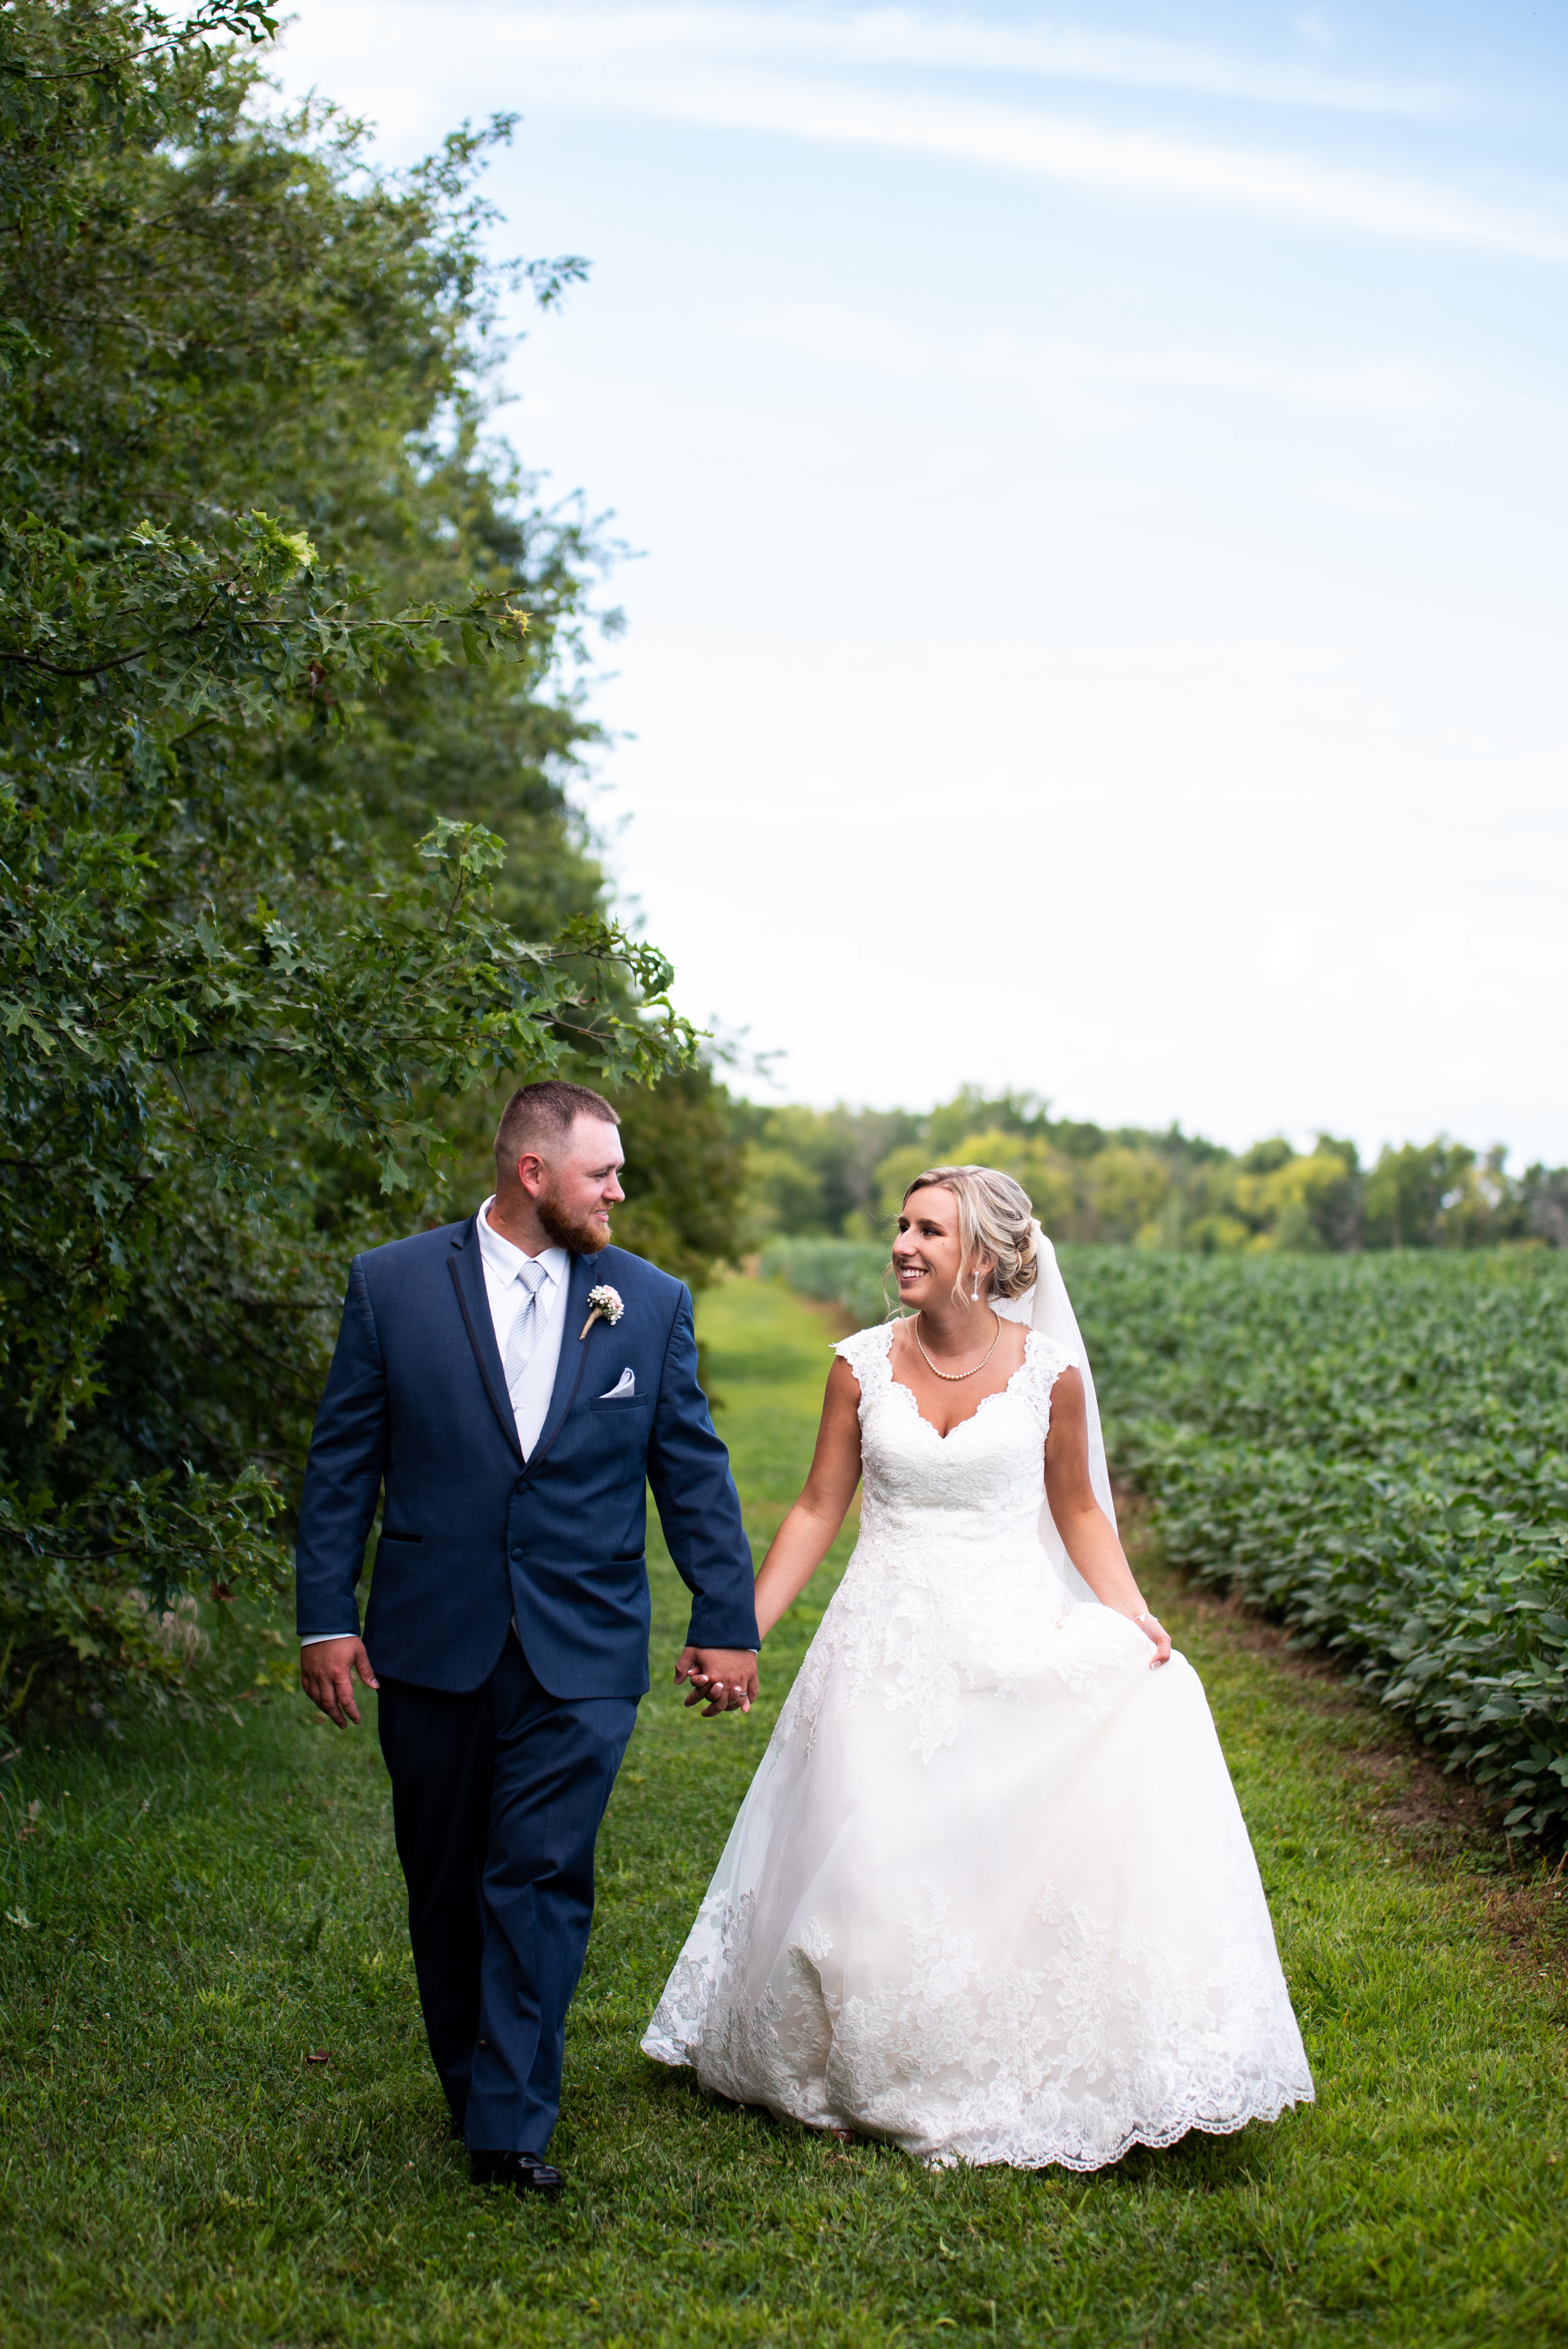 wedding (1 of 1)-186.jpg